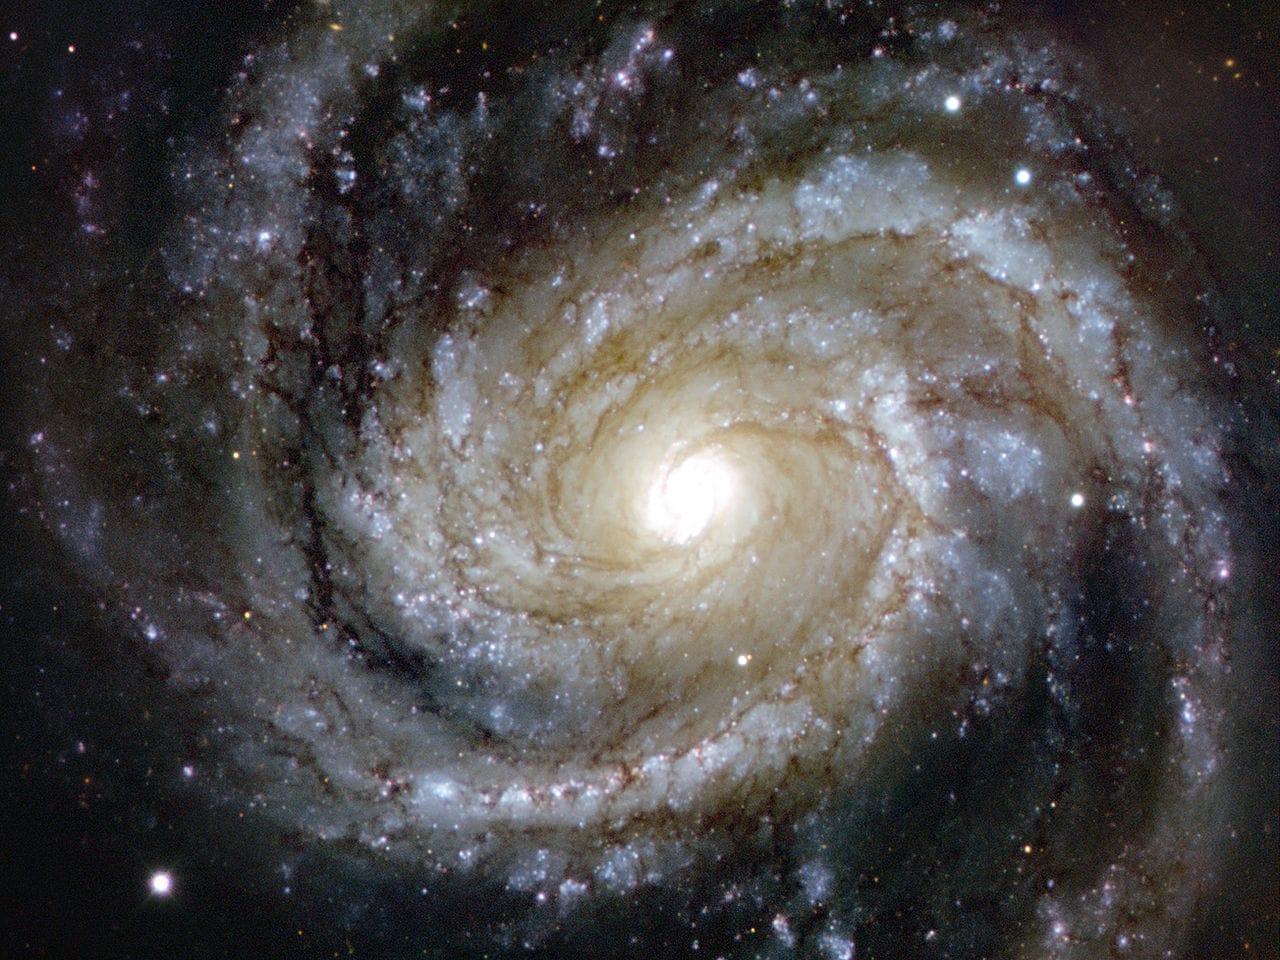 m100,m100 galaxy,grand design spiral galaxy,ngc 4321